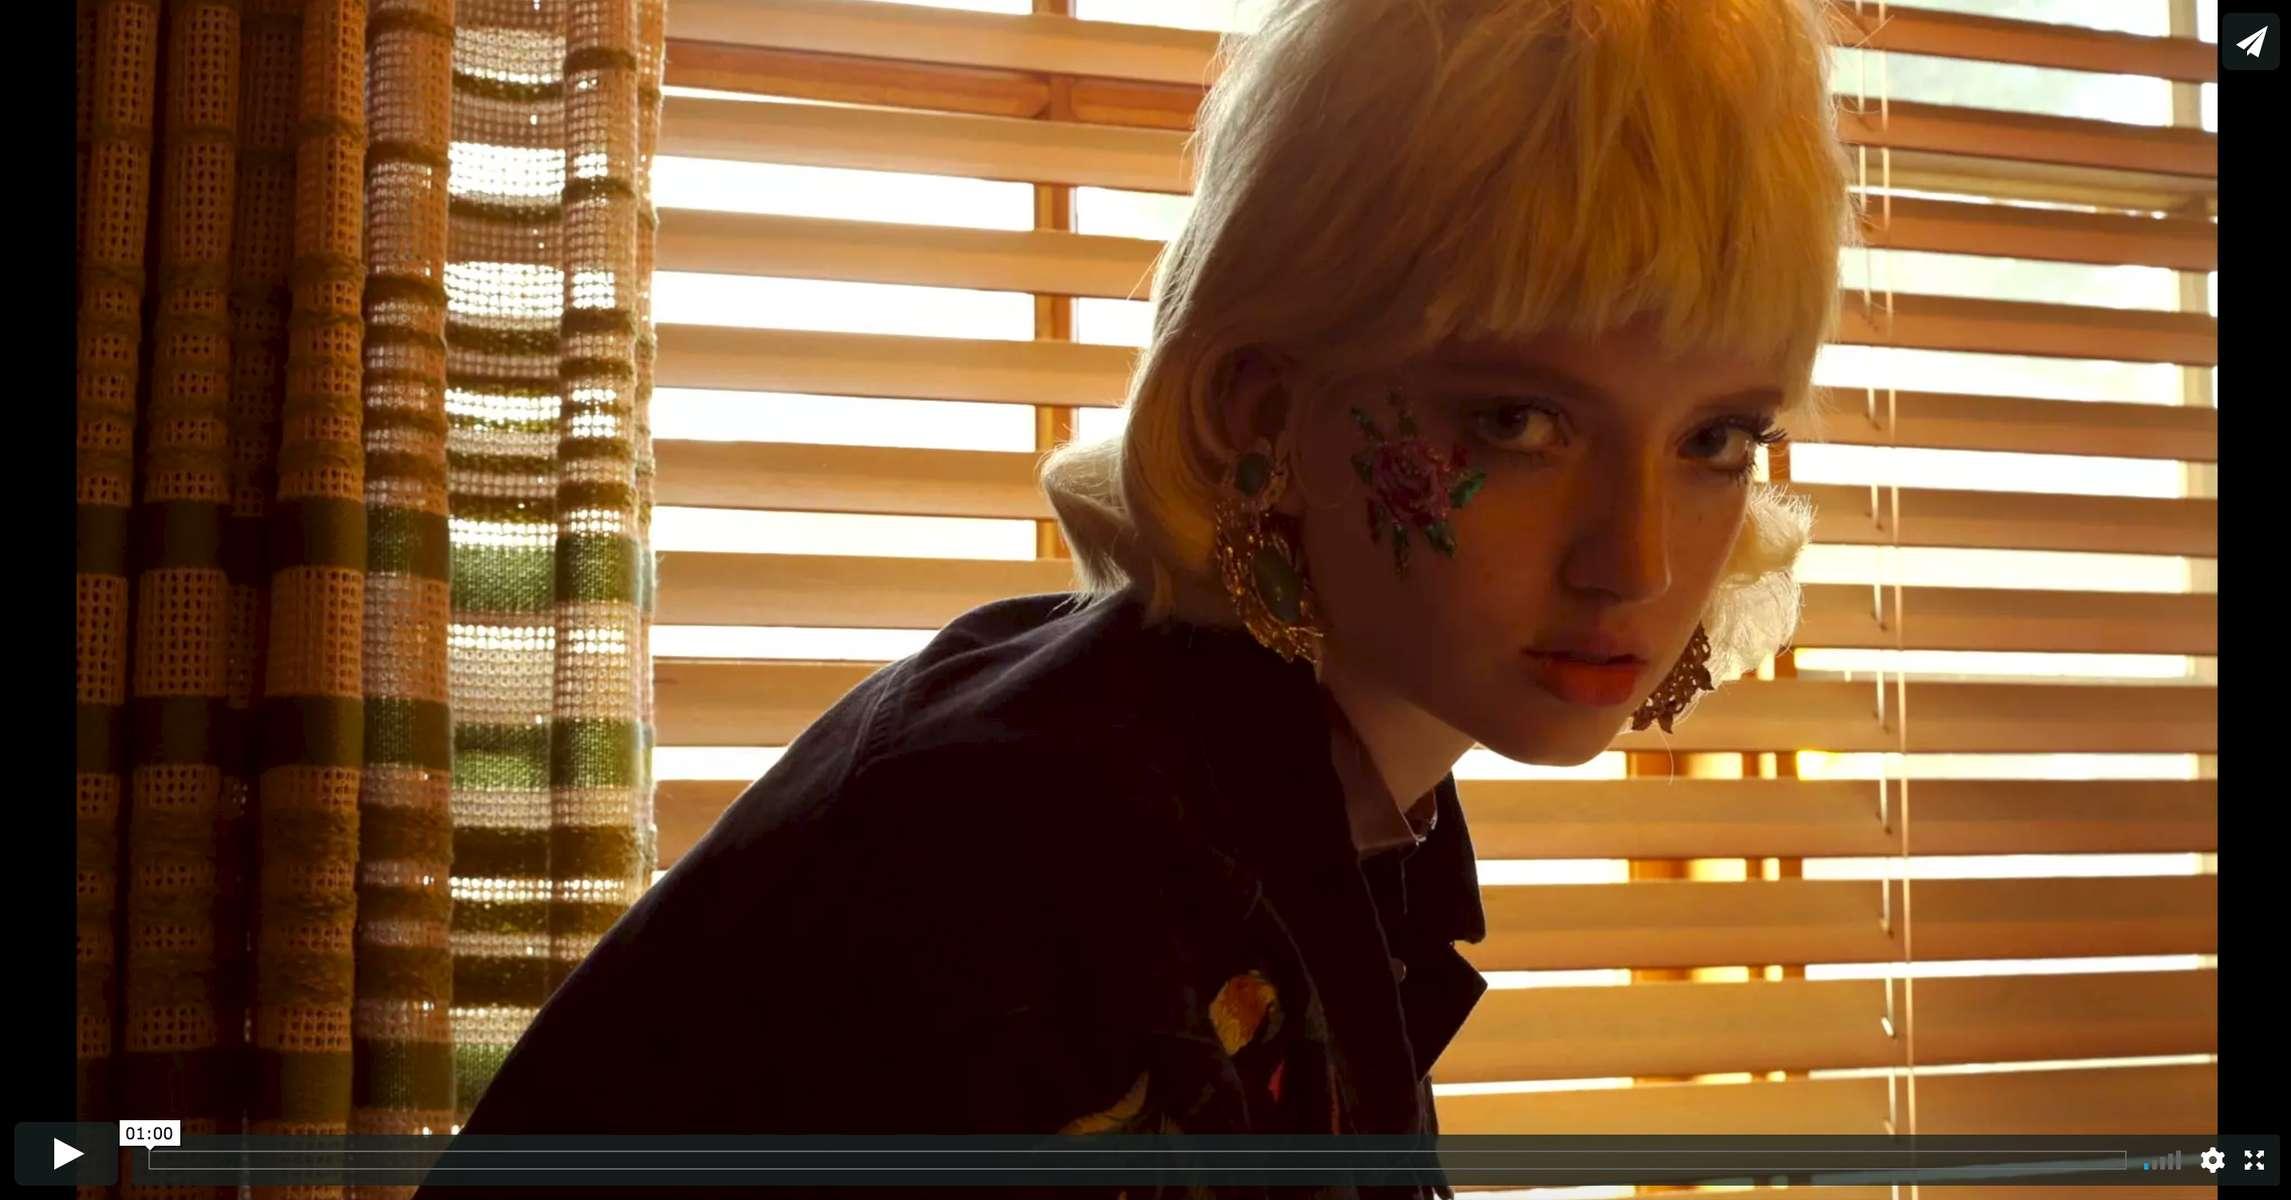 GUCCI_IS_LIFE_LAUD_MAGAZINE_Vimeo